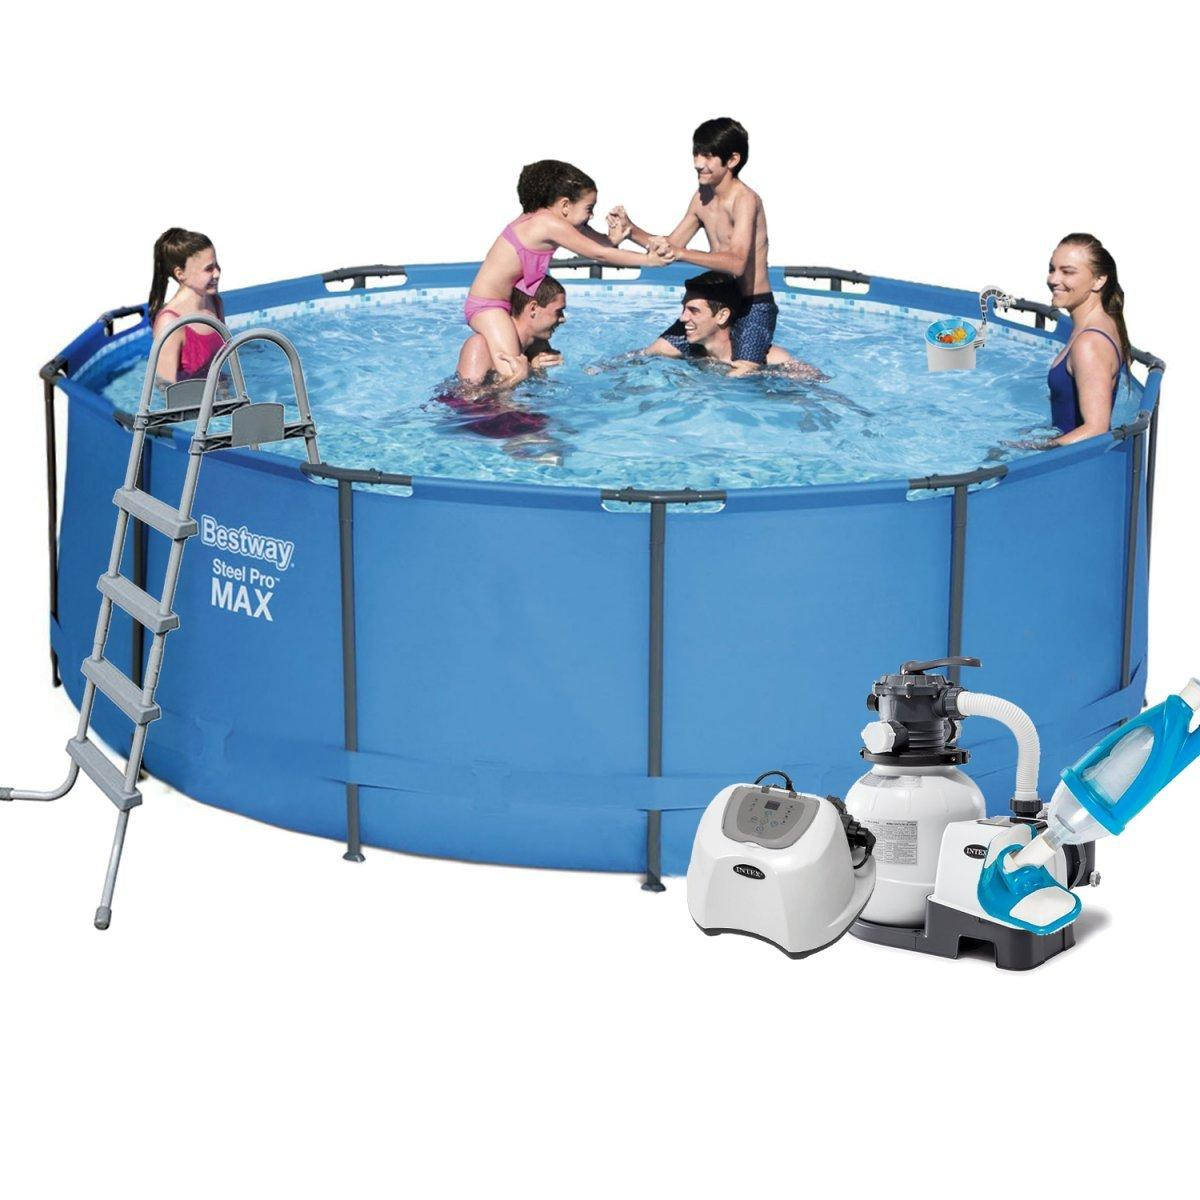 Каркасный бассейн Bestway 5614S - 10, 366 х 122 см